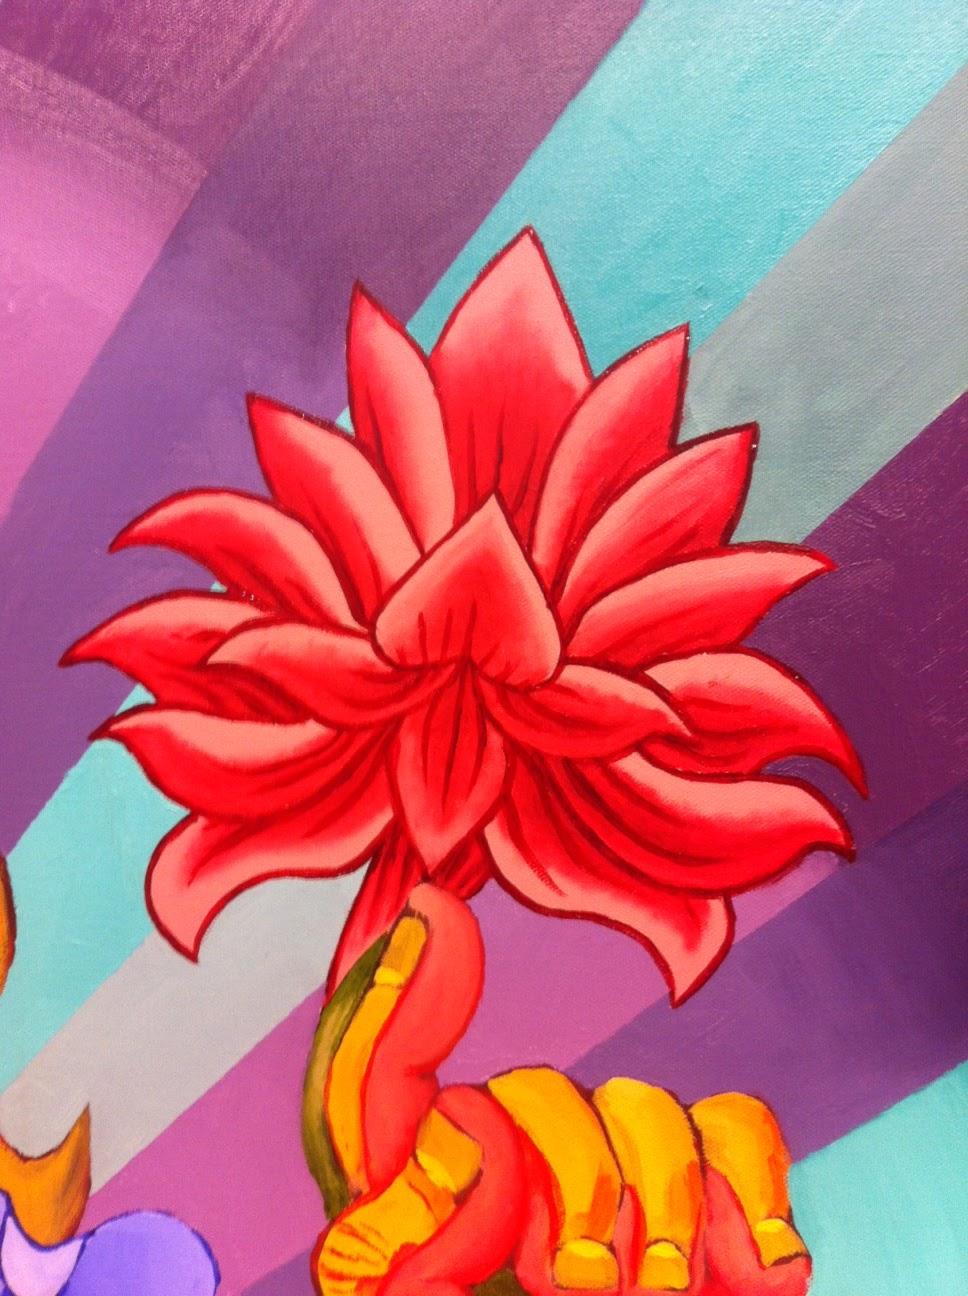 Crimson Lotus Flower Choice Image Flower Wallpaper Hd